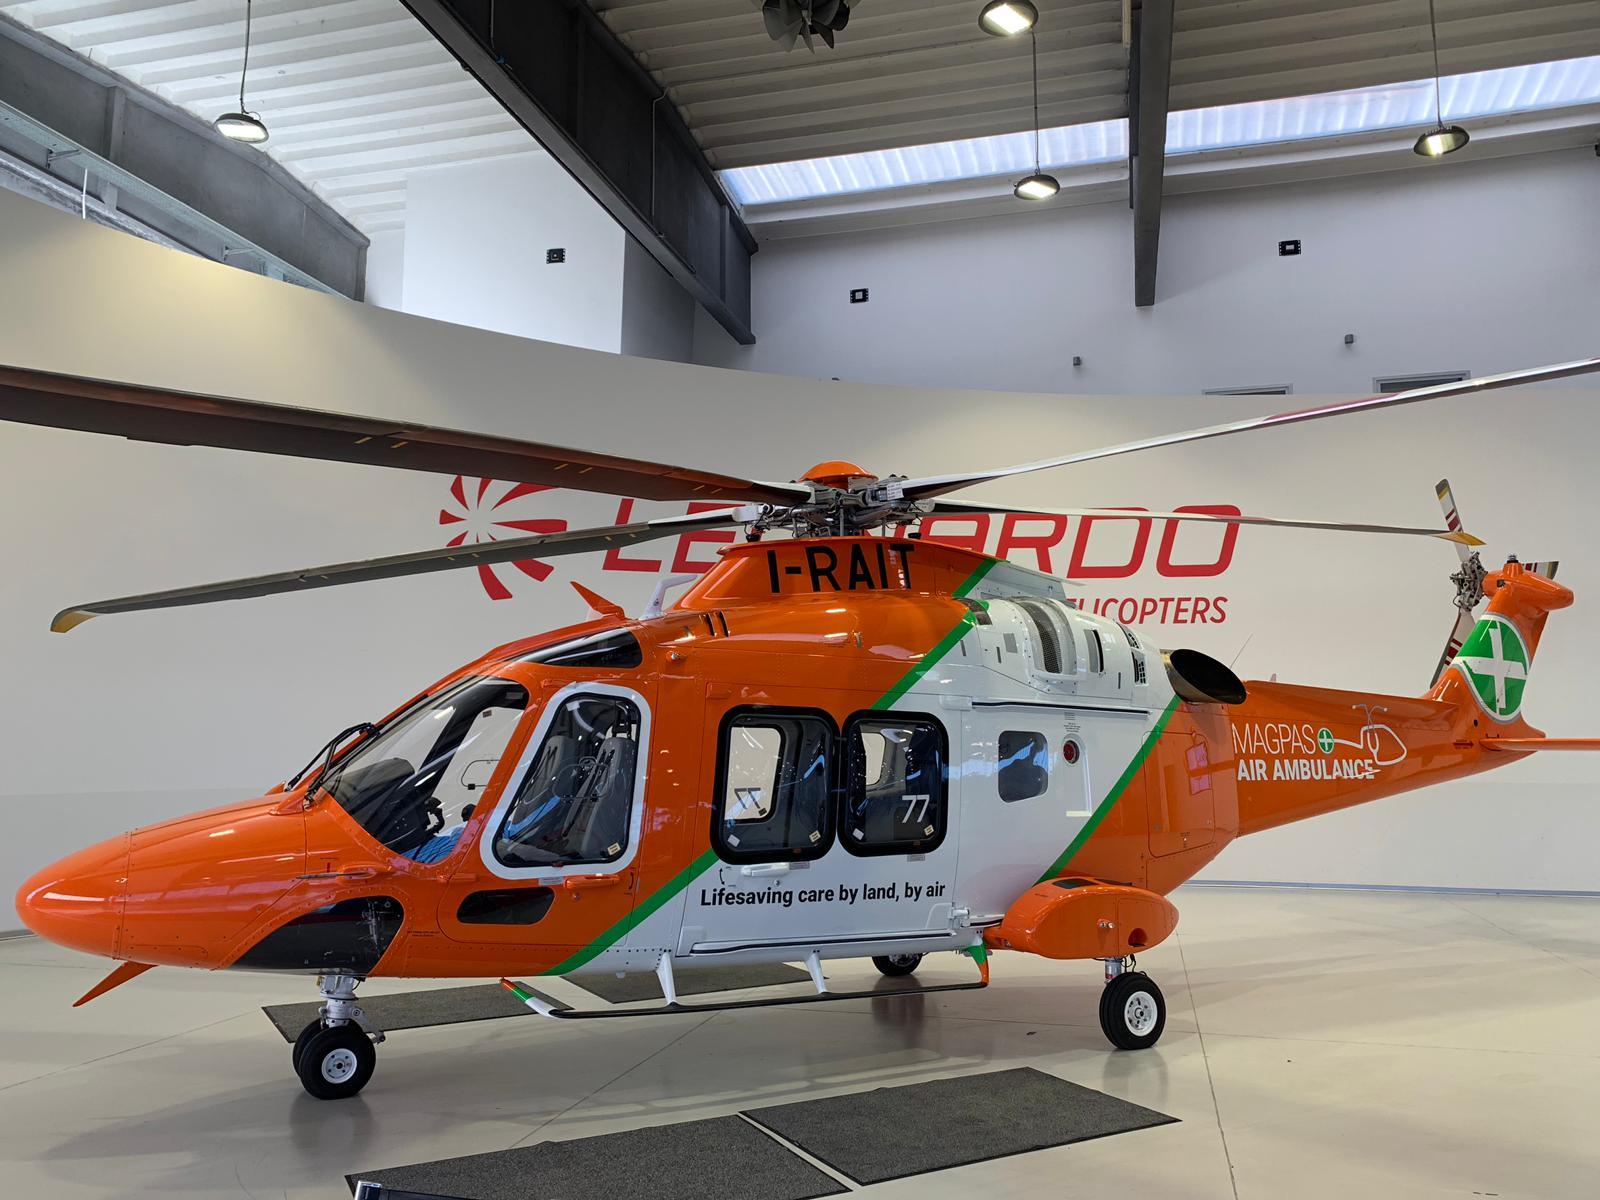 The-new-Magpas-Air-Ambulance-finally-looks-the-part.JPG